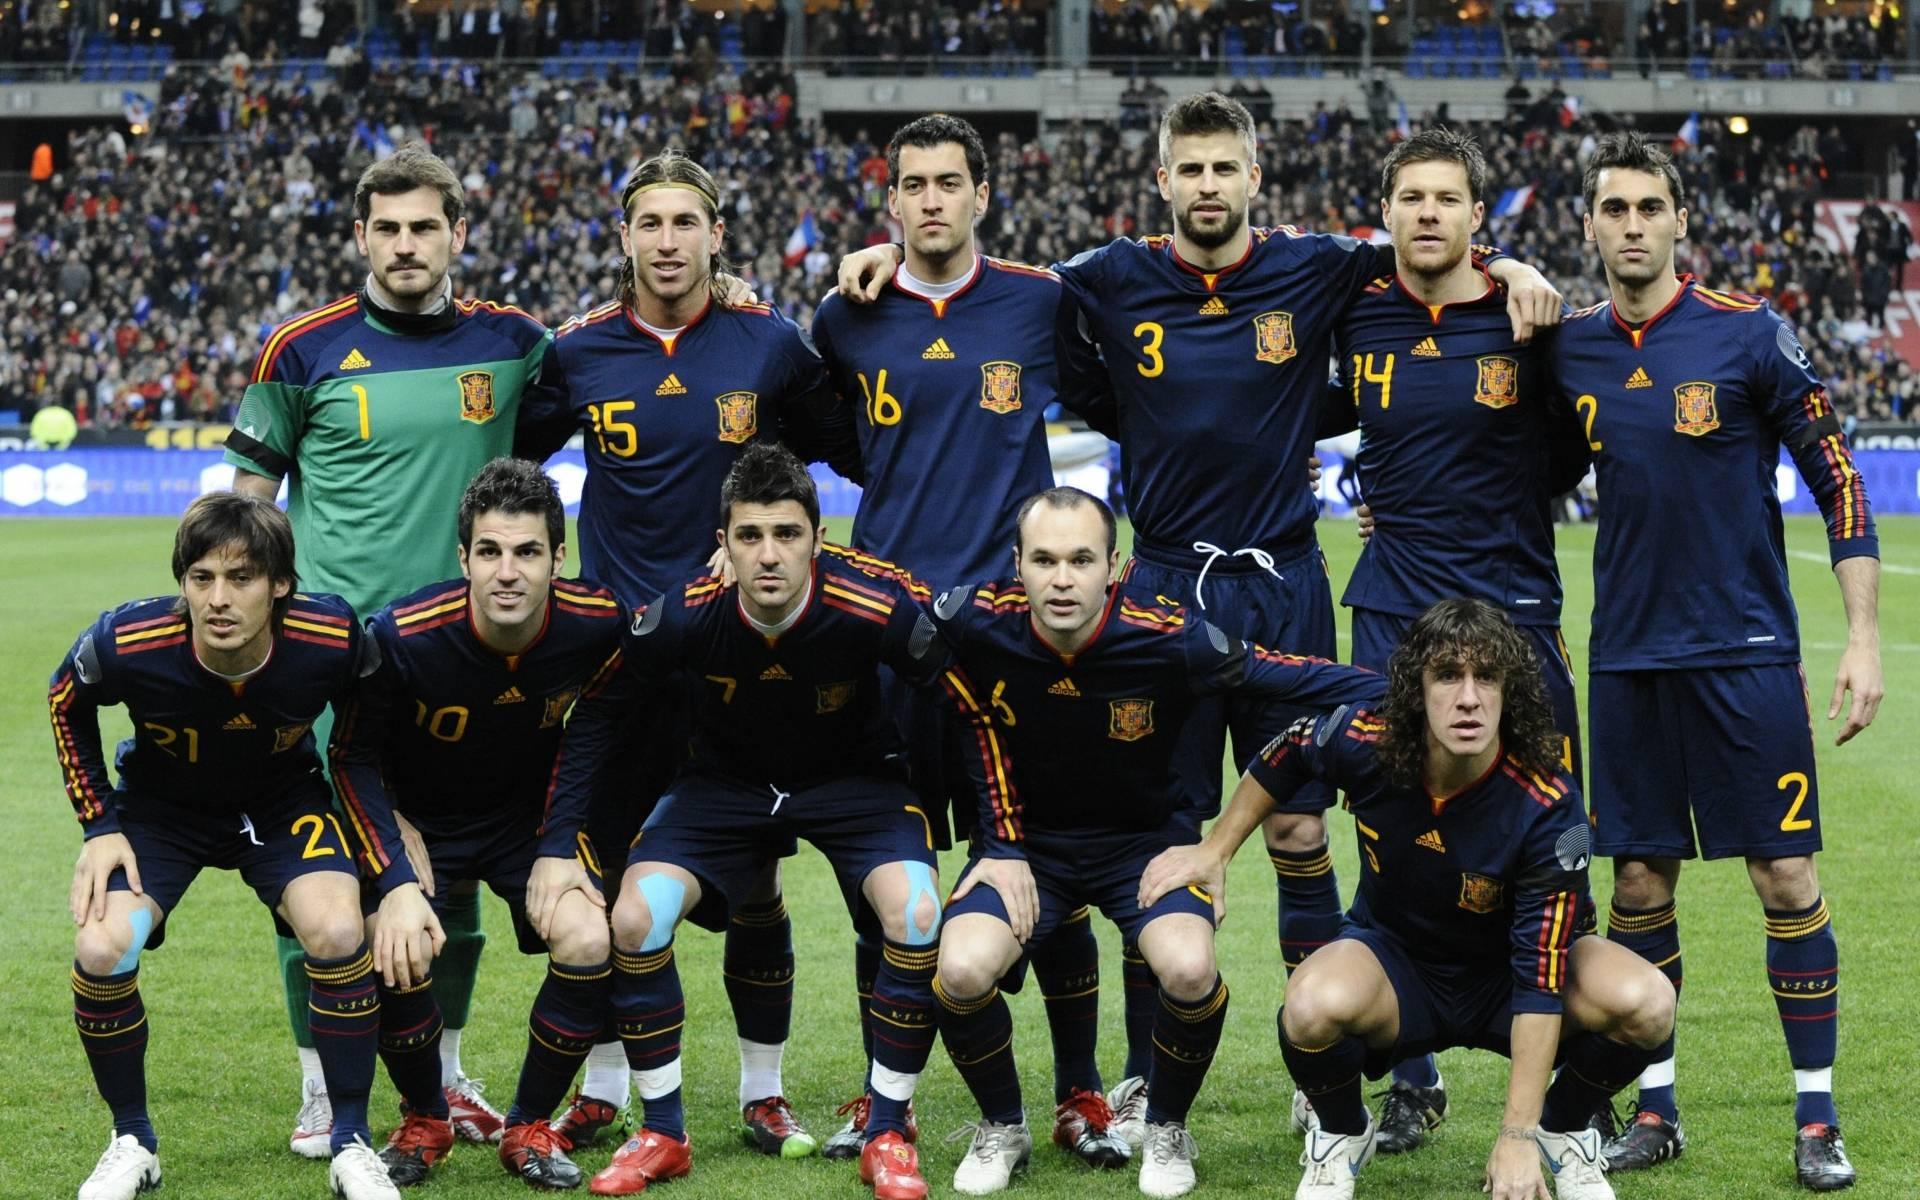 Spain Football Team Squad Wallpaper   Football HD Wallpapers 1920x1200